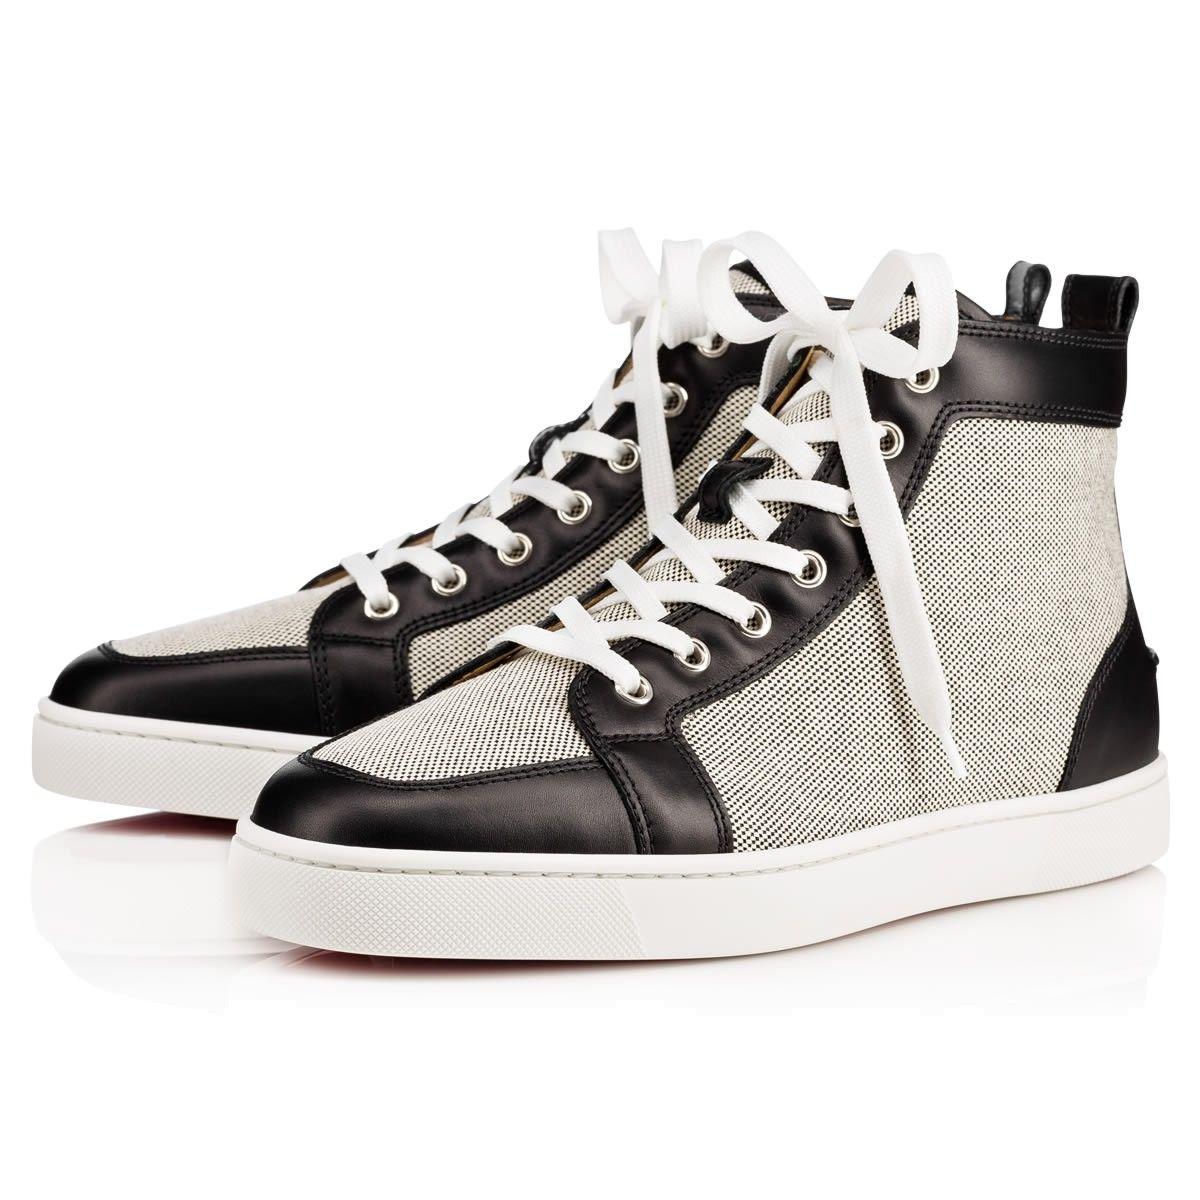 971b23a30ec Shoes - Rantus Men s Flat - Christian Louboutin